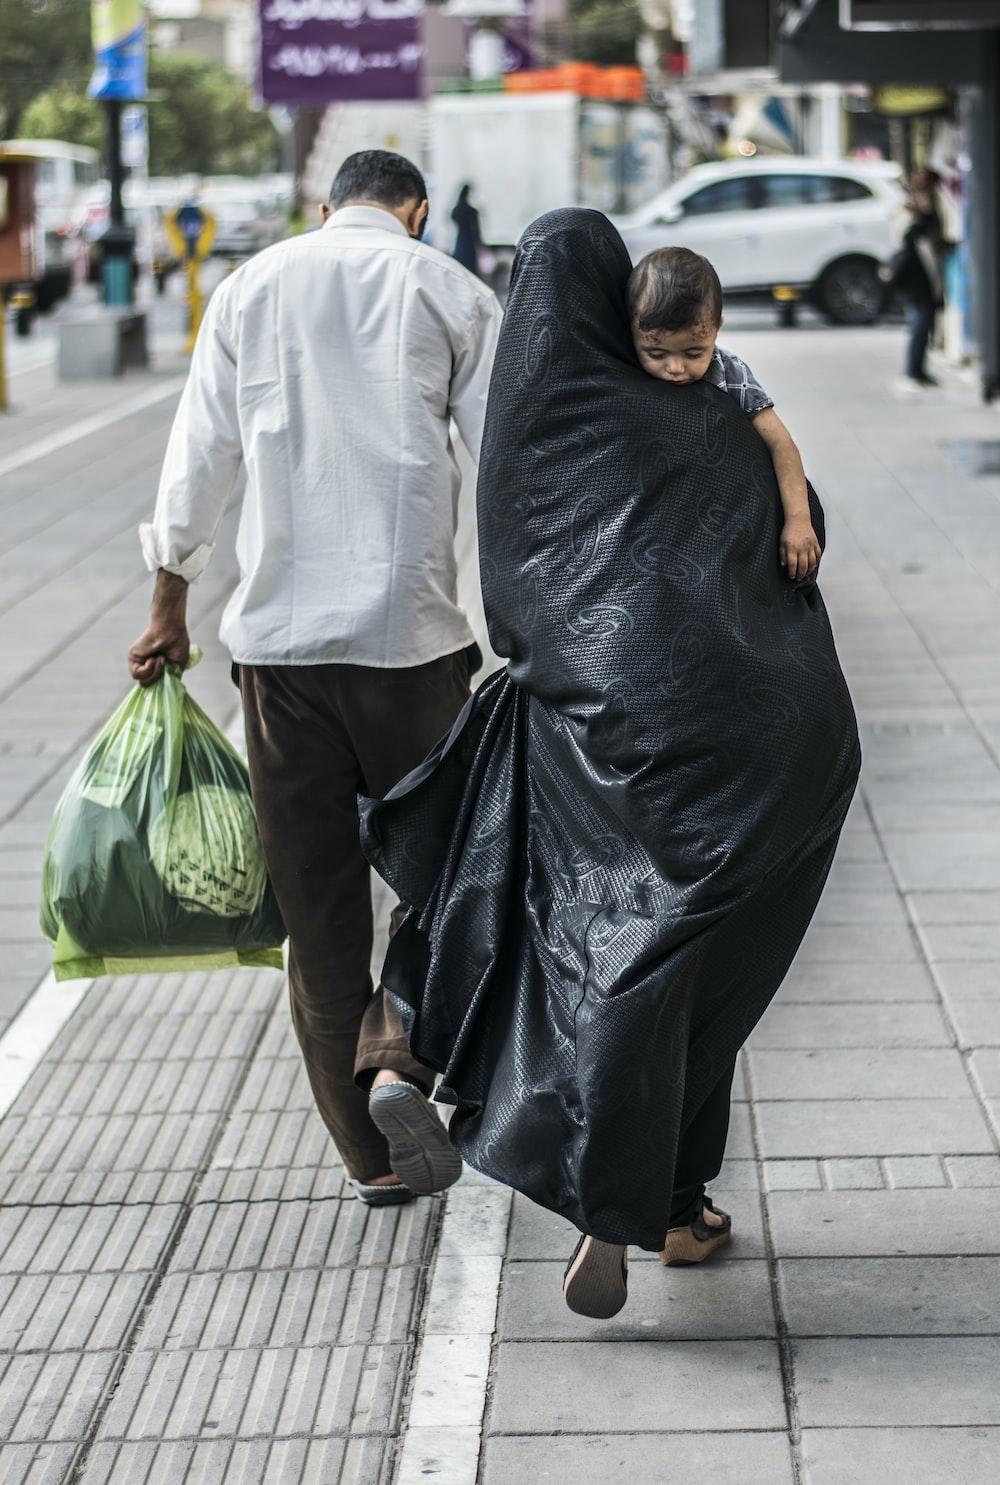 woman in black dress holding green plastic bag